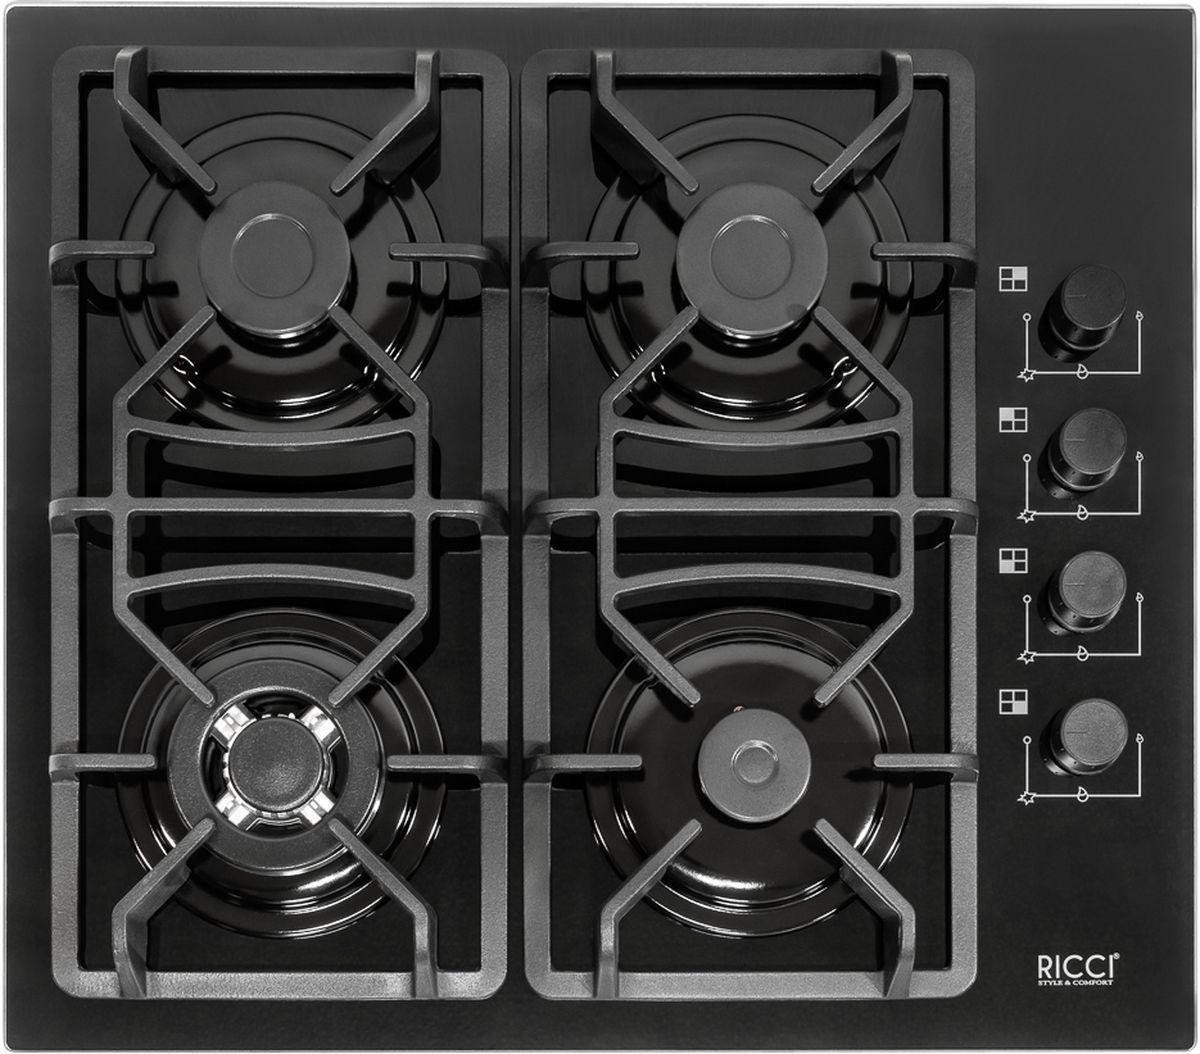 Варочная панель Ricci RGN-670BL, Black, встраиваемая